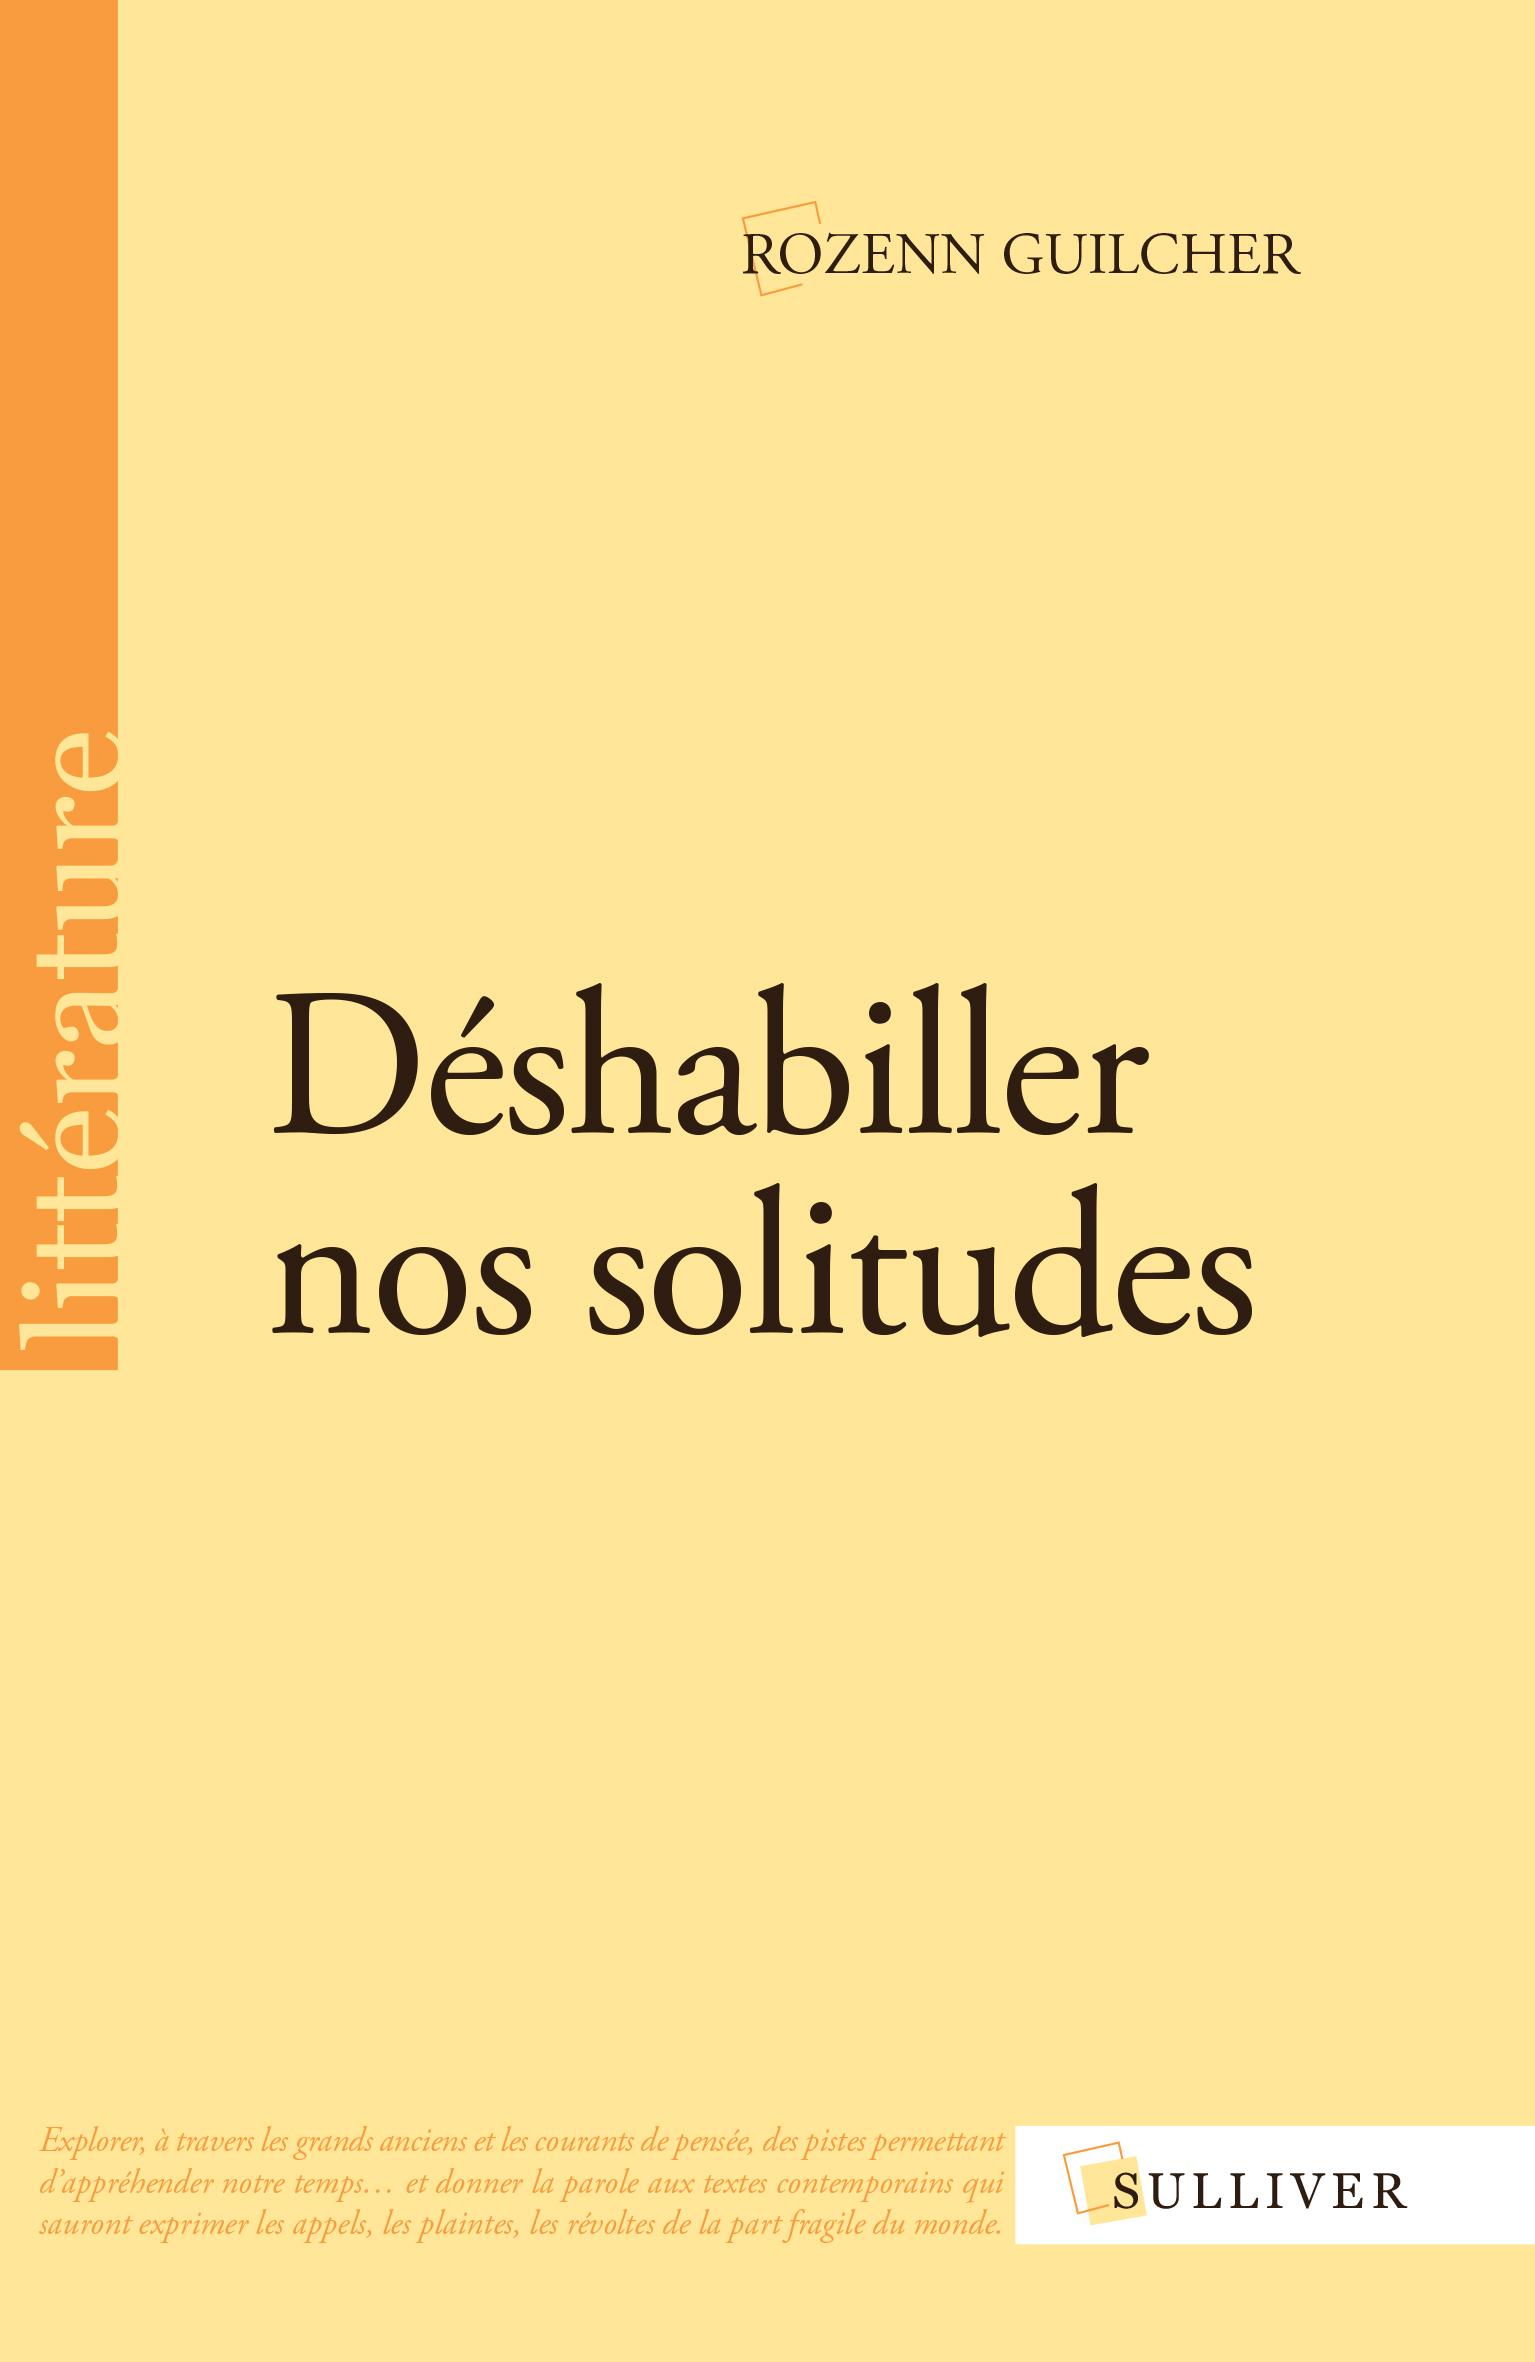 Livre Rozenn Guilcher Déshabiller nos solitudes